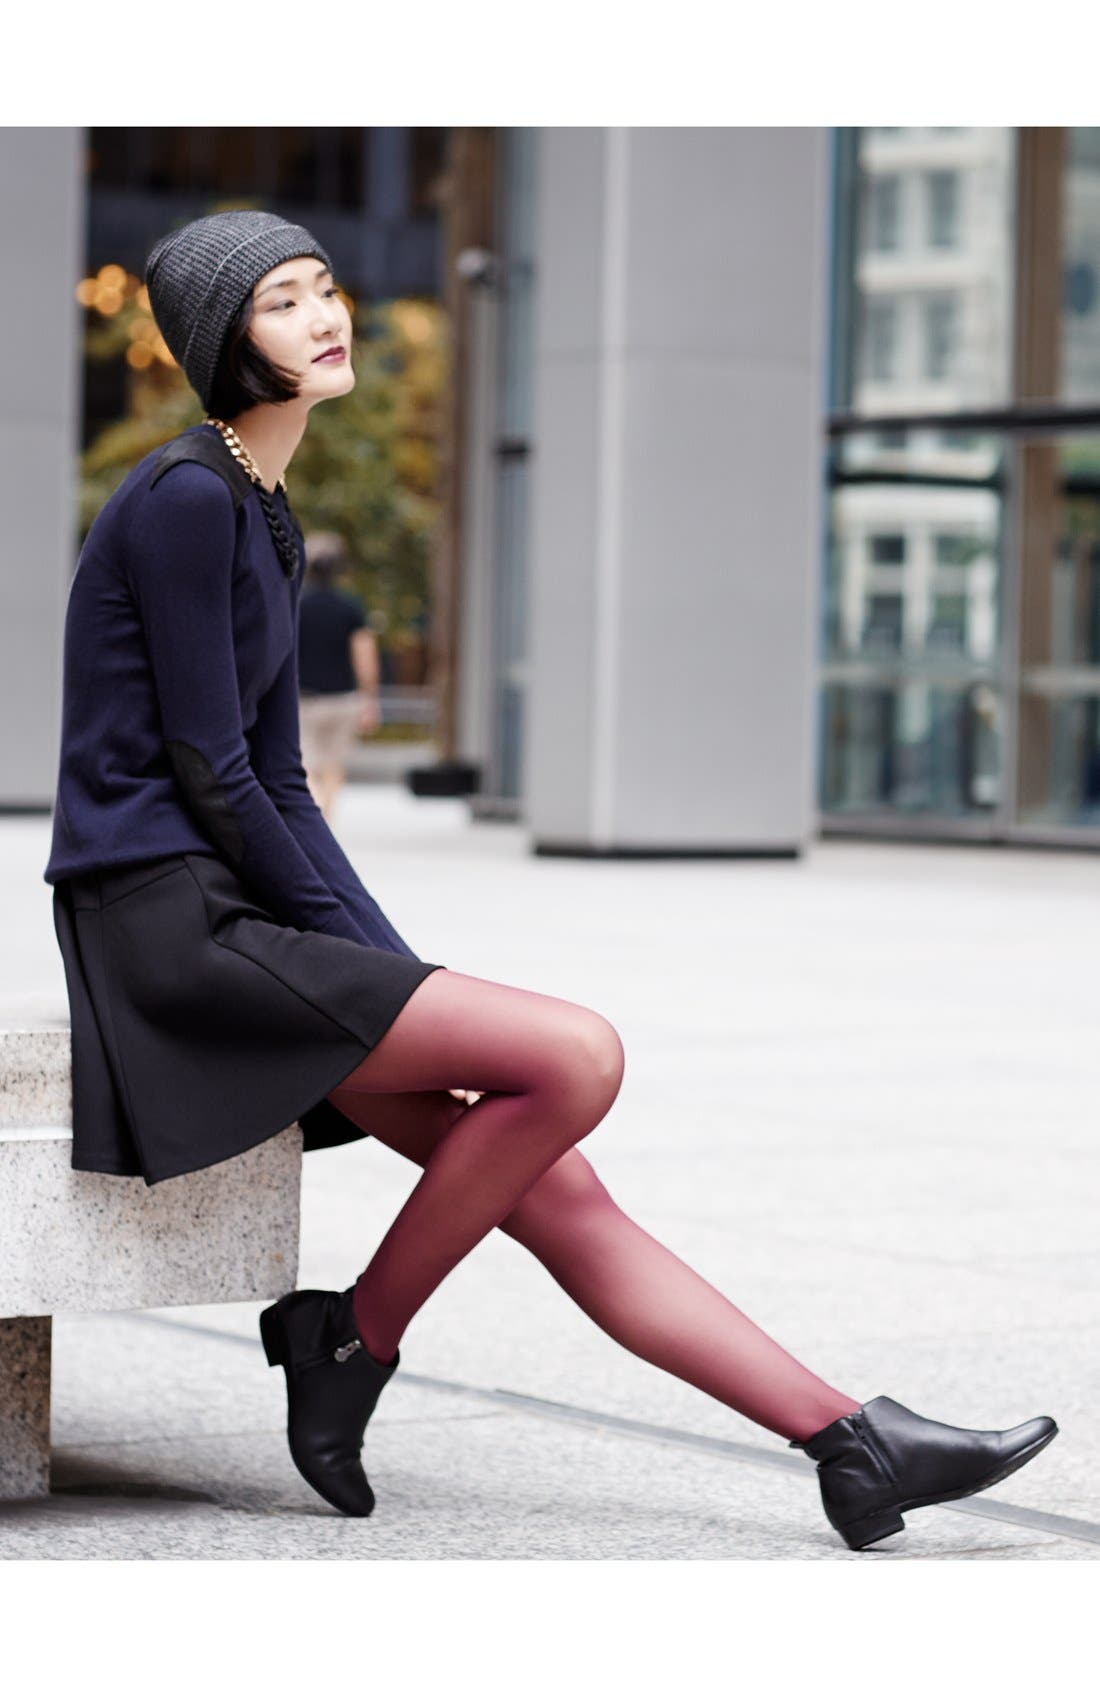 Munro Boot, Halogen® Dress & DKNY Tights